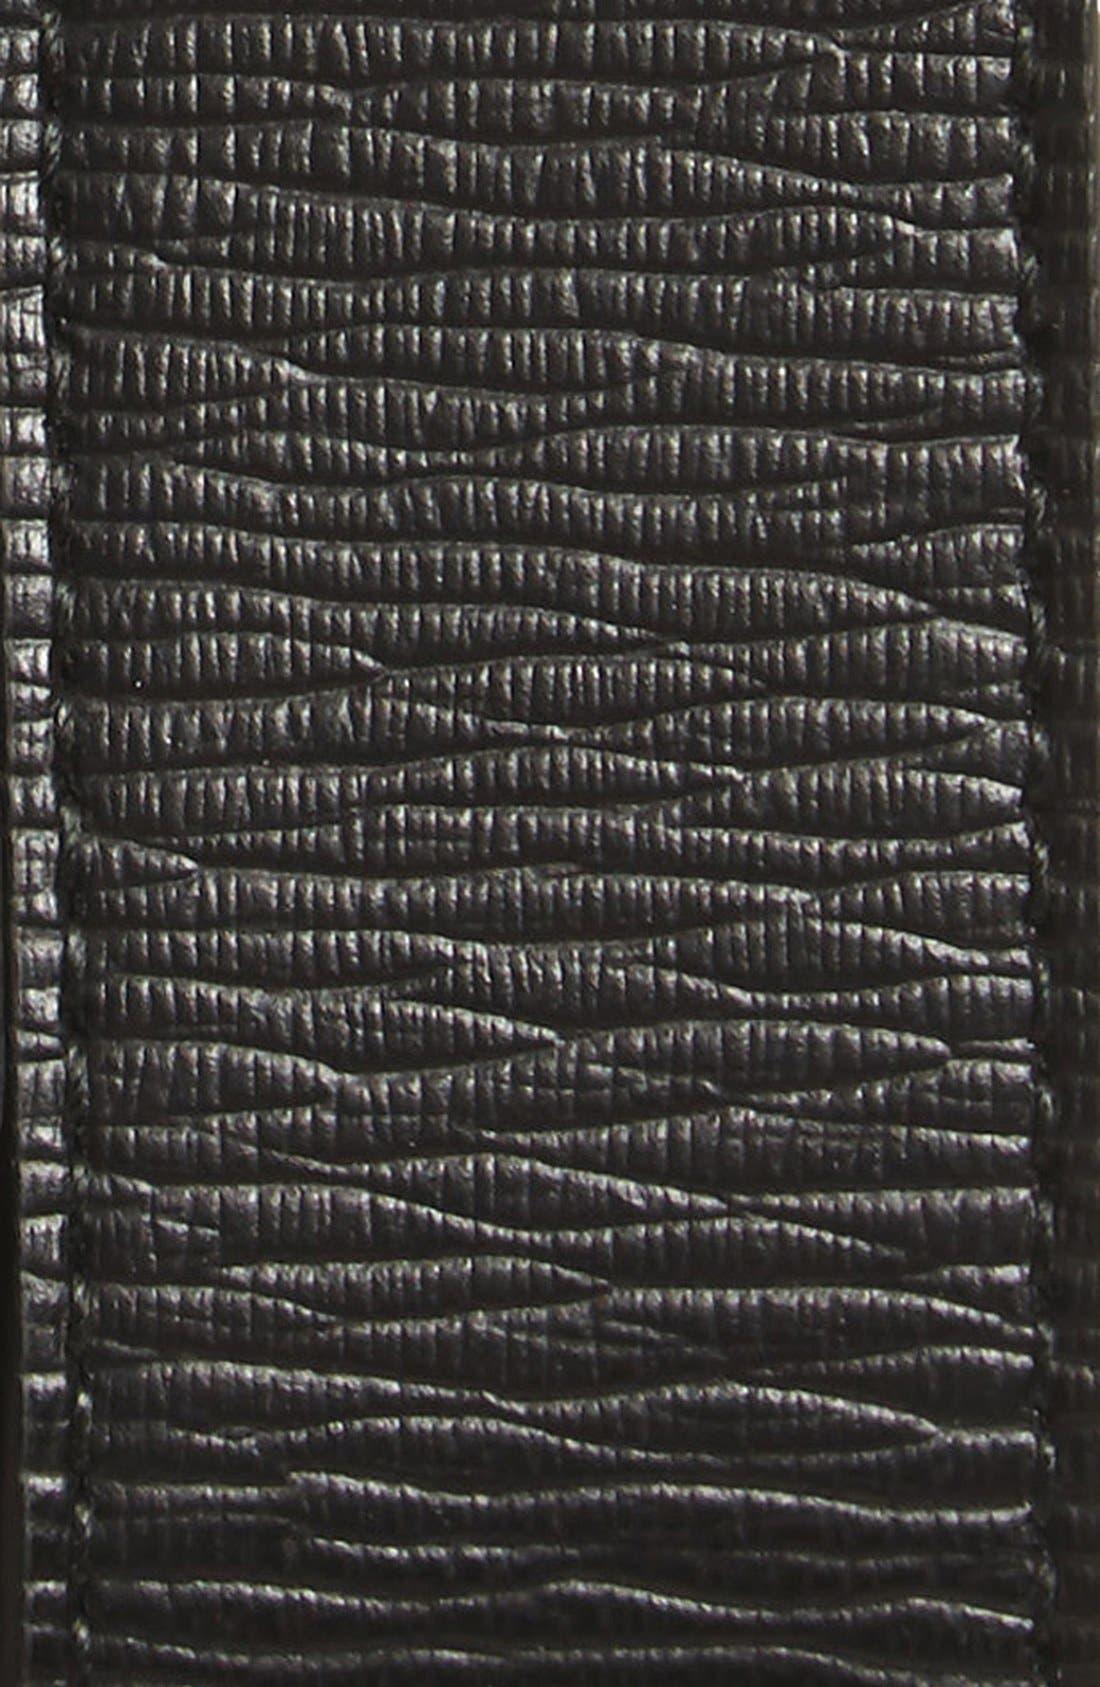 SALVATORE FERRAGAMO, Revival Reversible Leather Belt, Alternate thumbnail 4, color, BLACK/BROWN